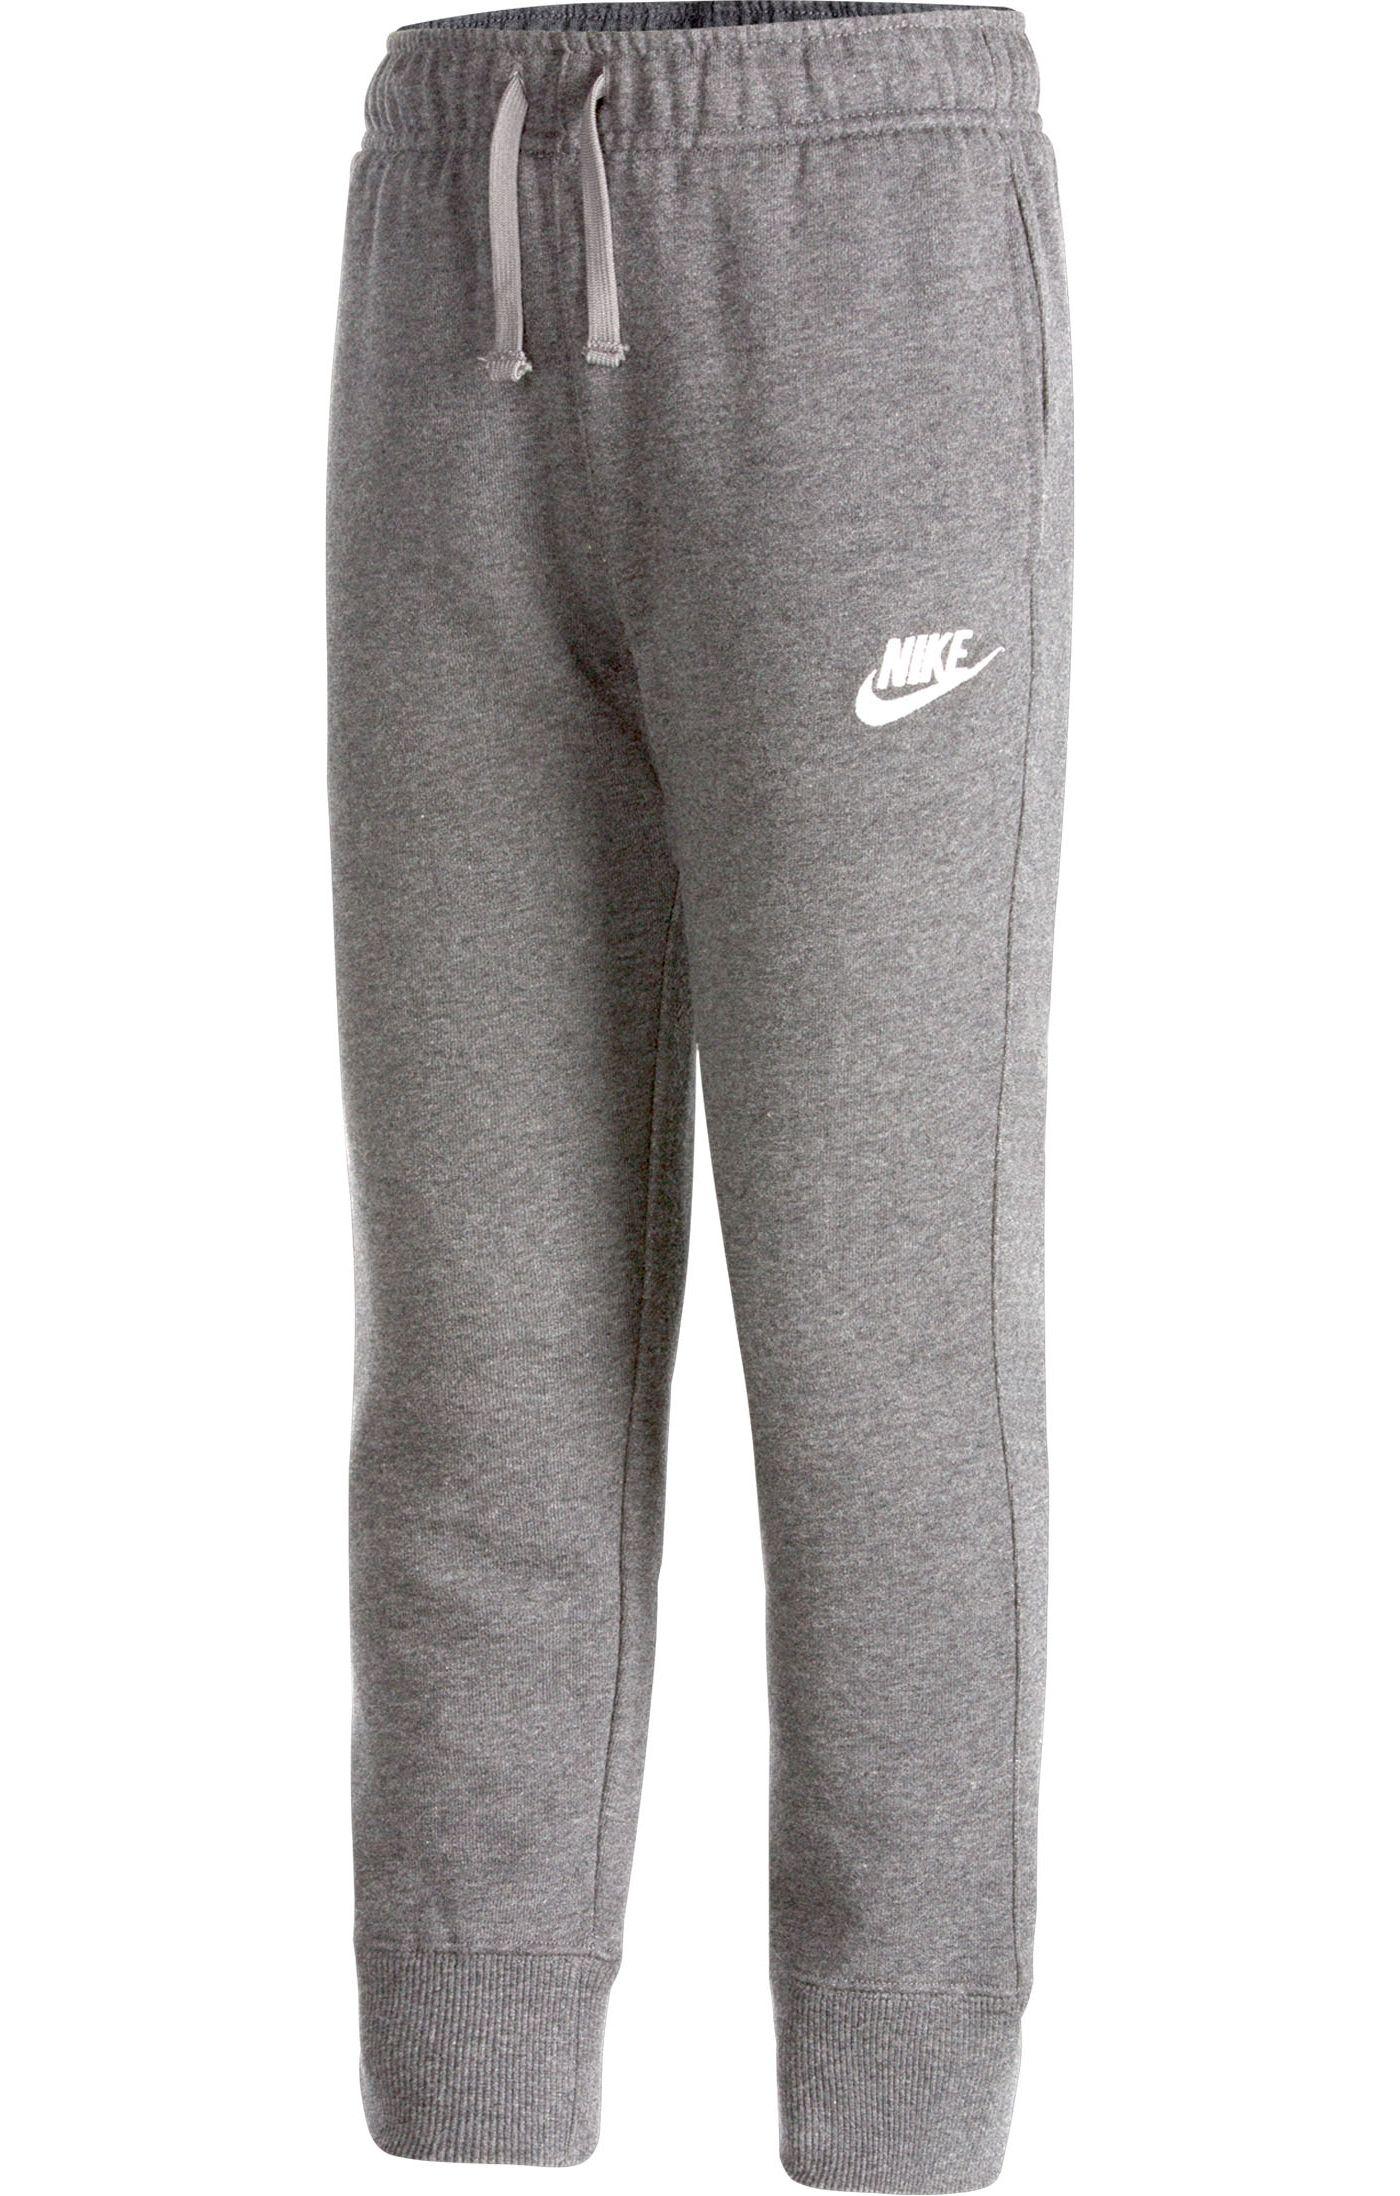 Nike Little Boys' Club Fleece Ribbed Cuff Pants